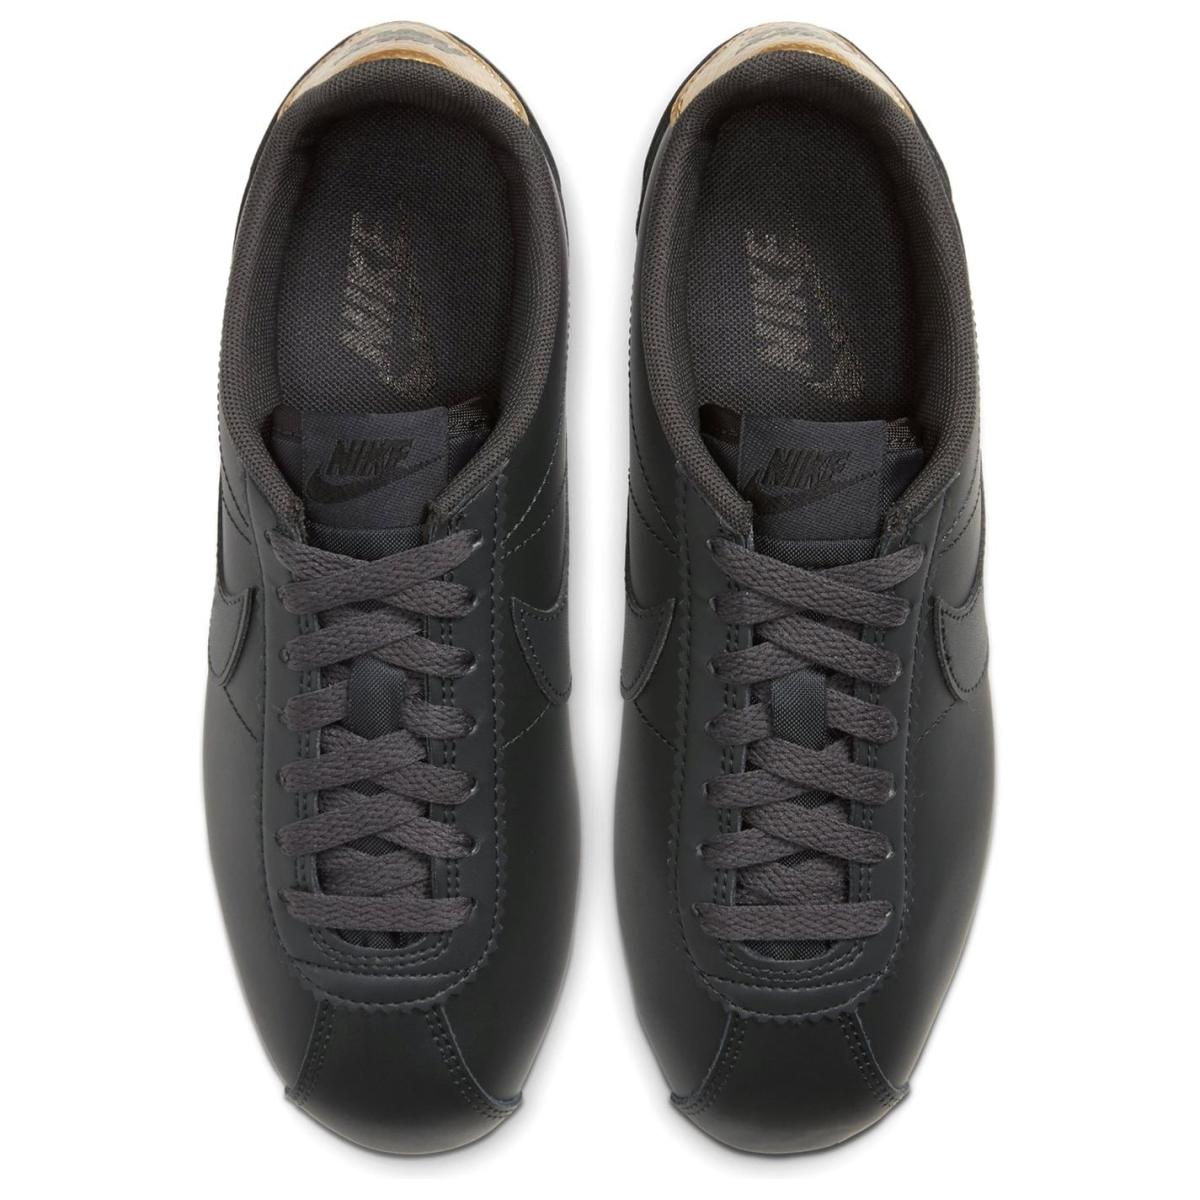 Nike Classic Cortez Turnschuhe Damen Sneaker Sportschuhe Laufschuhe 4036